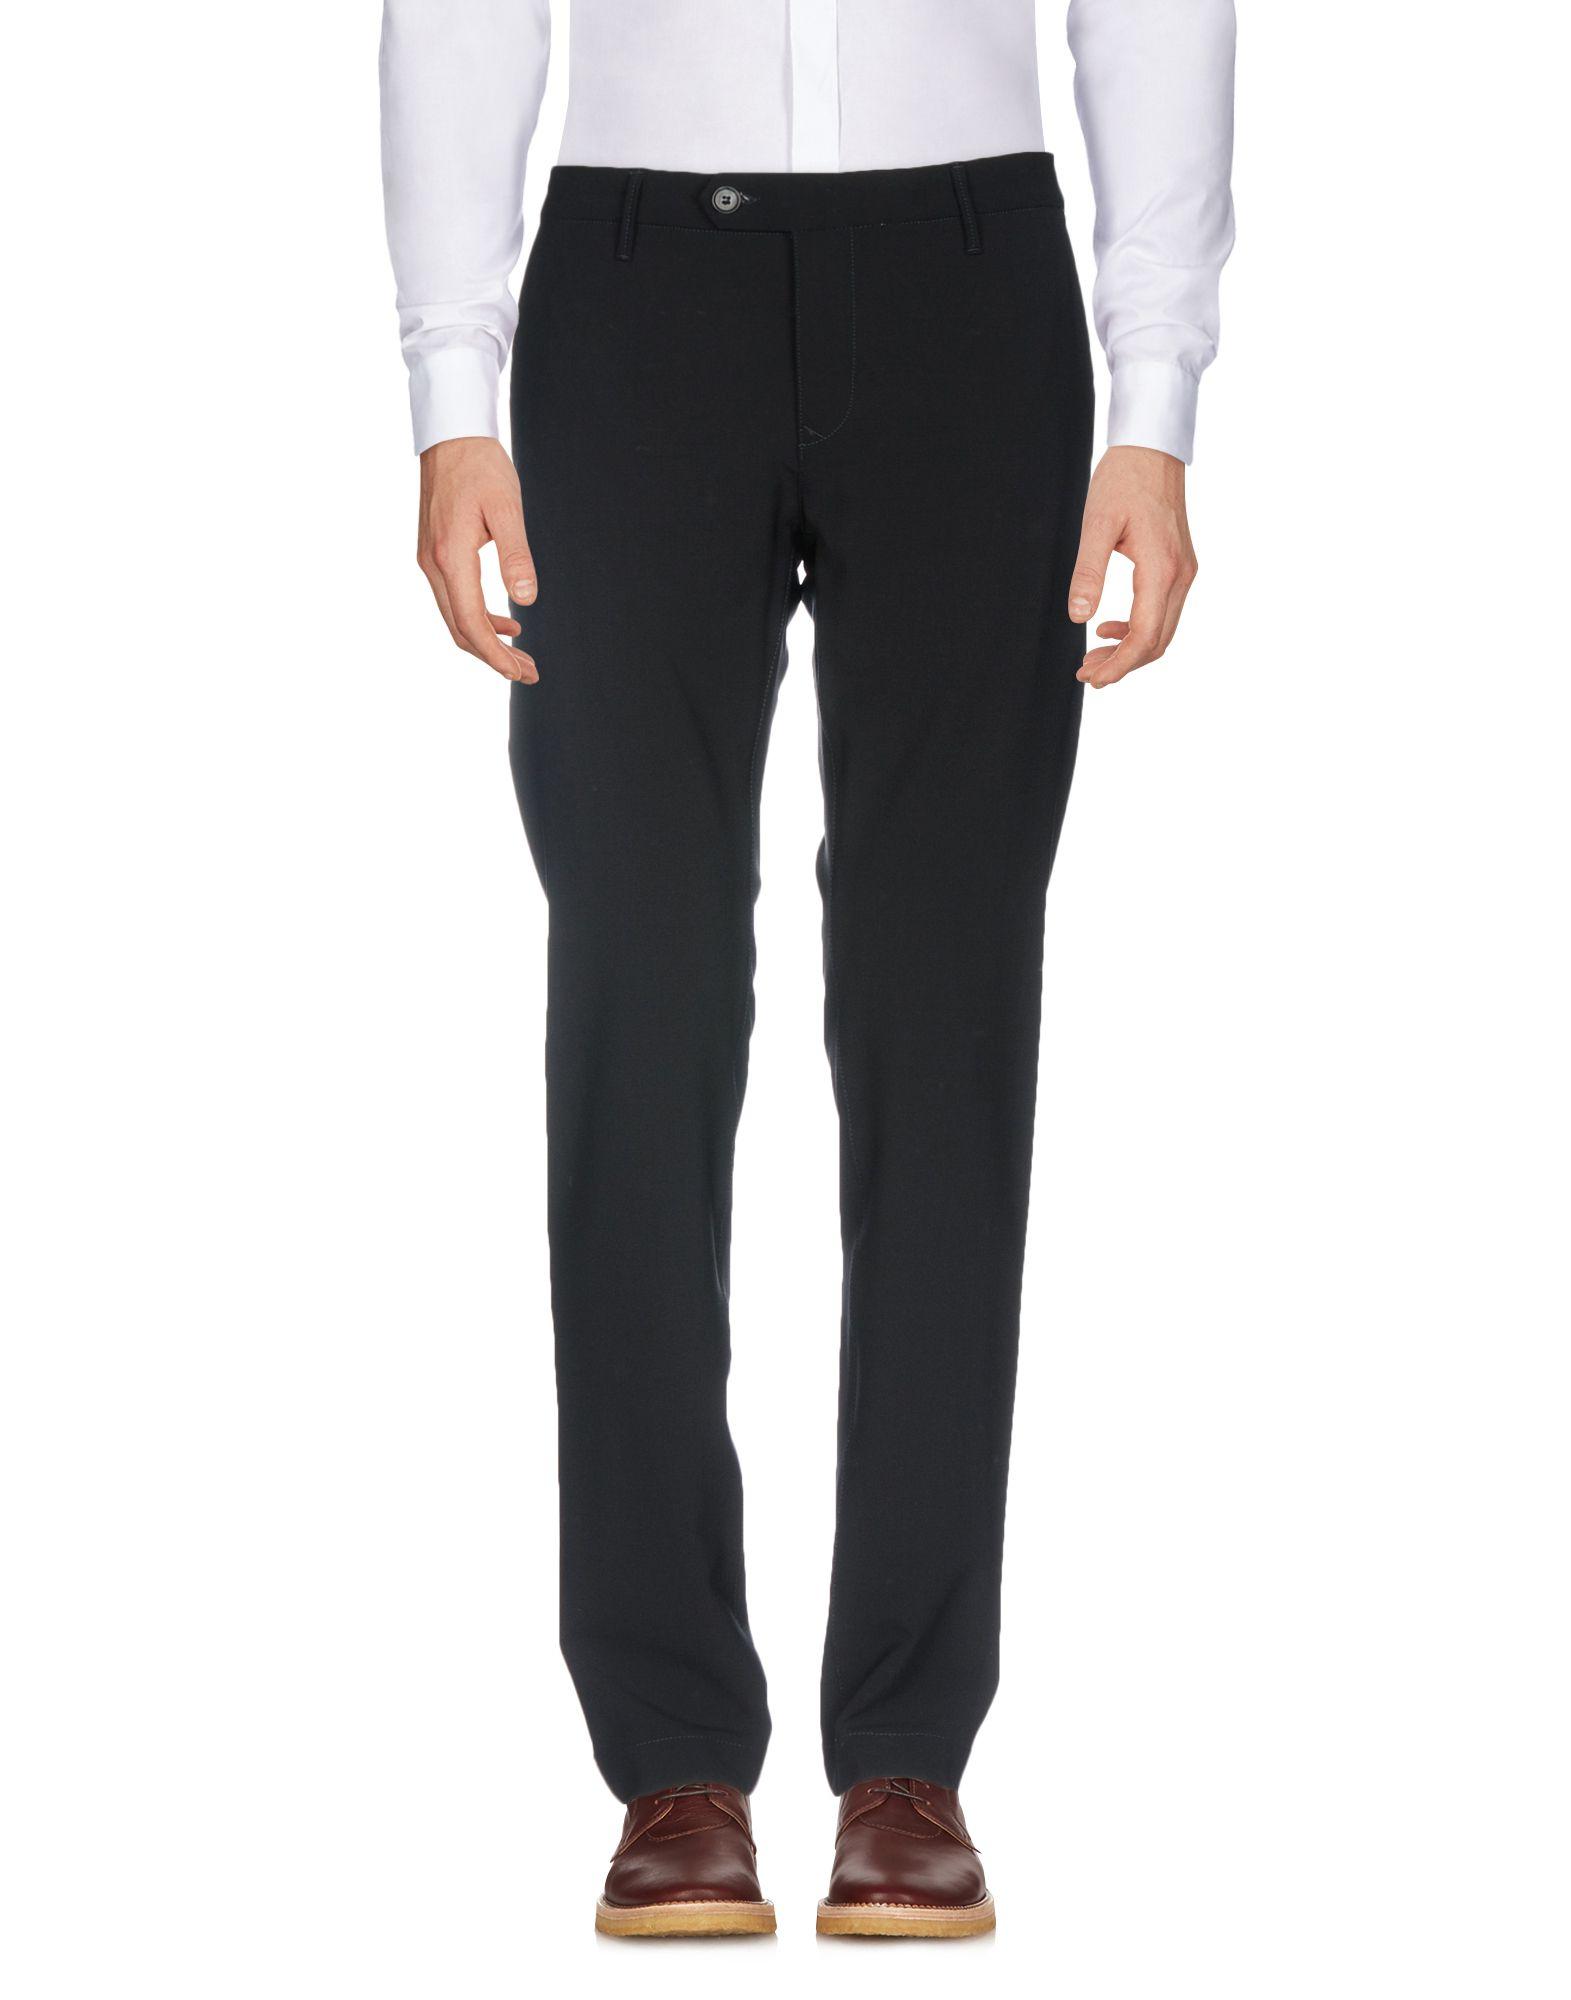 Pantalone Pantalone Pantalone Cruna Uomo - 13160126OR 57e97f